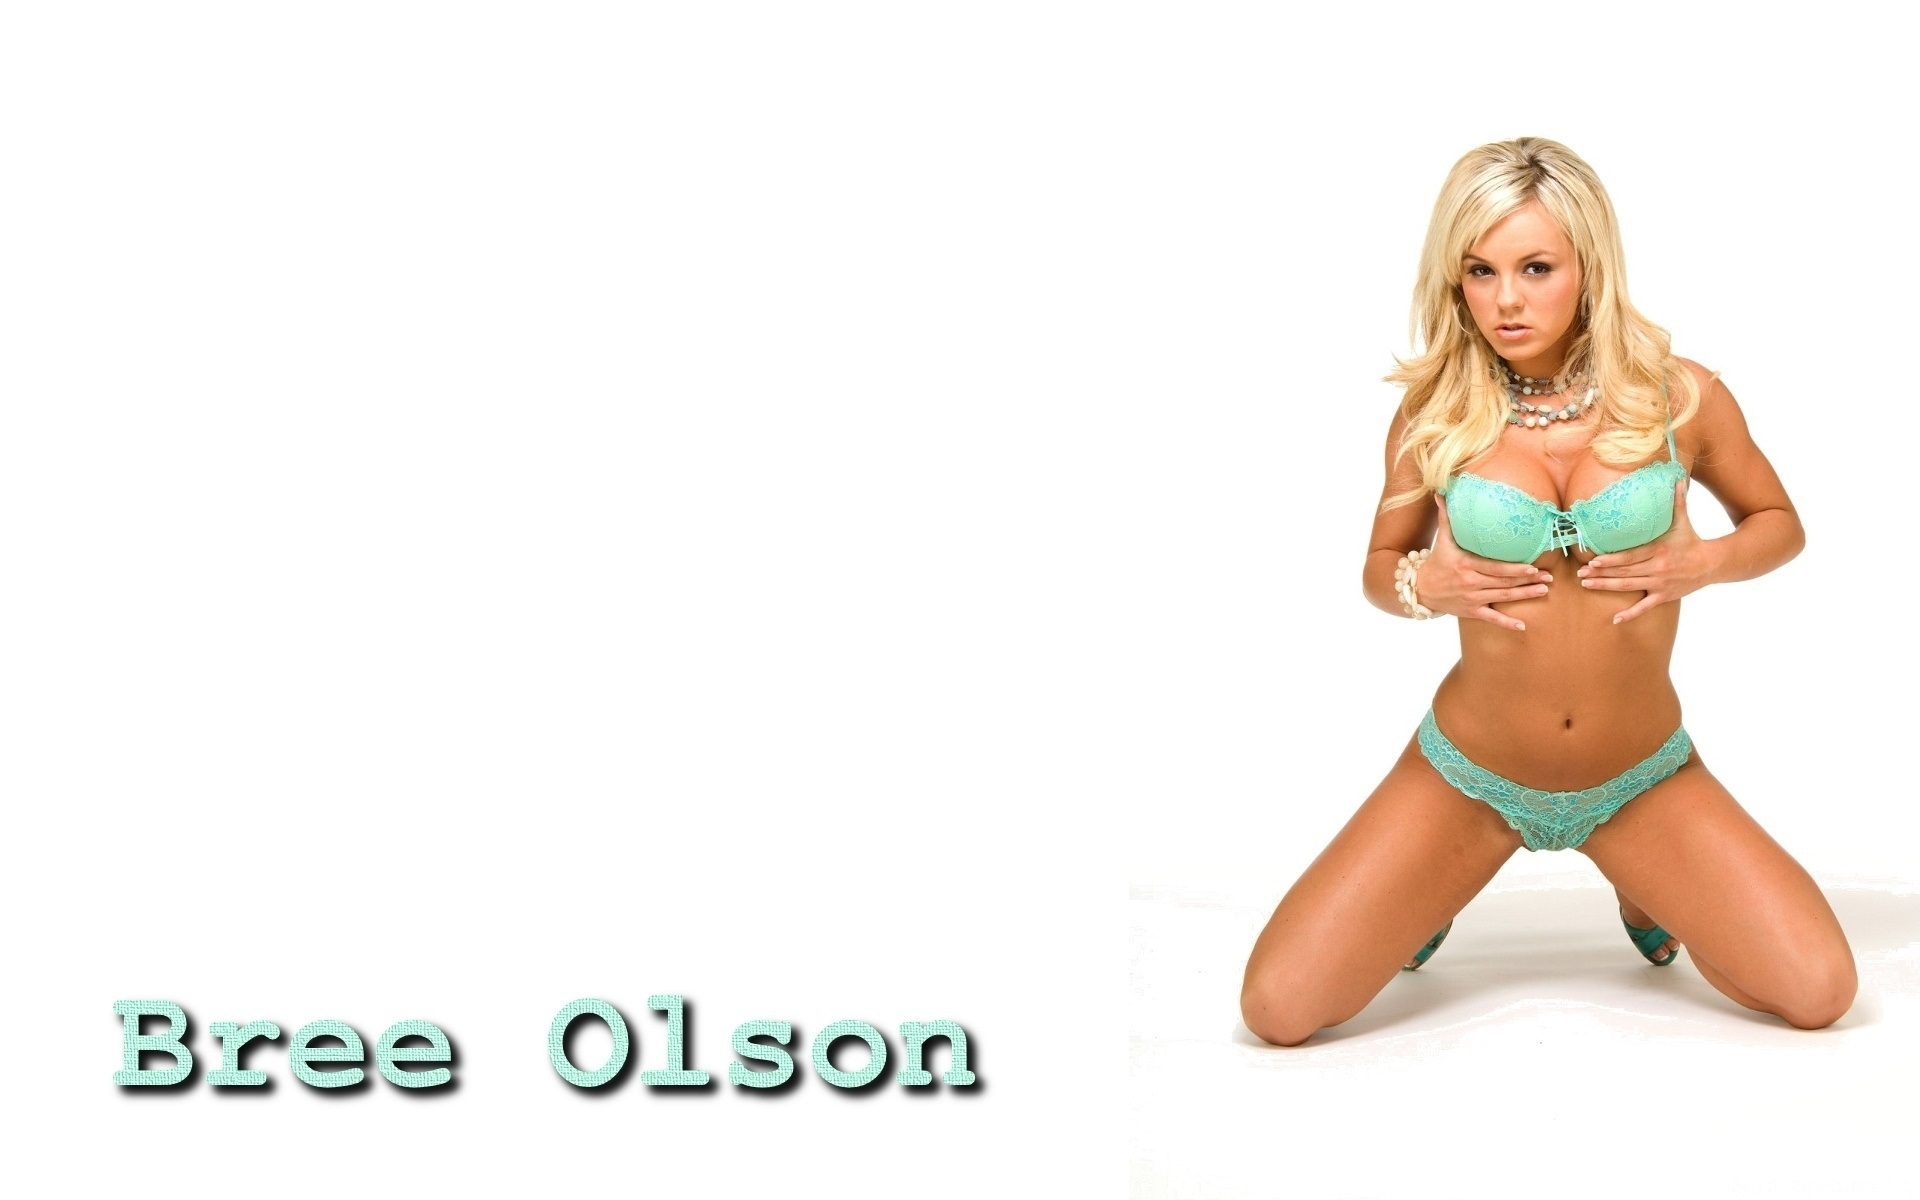 Bree Olson Hd